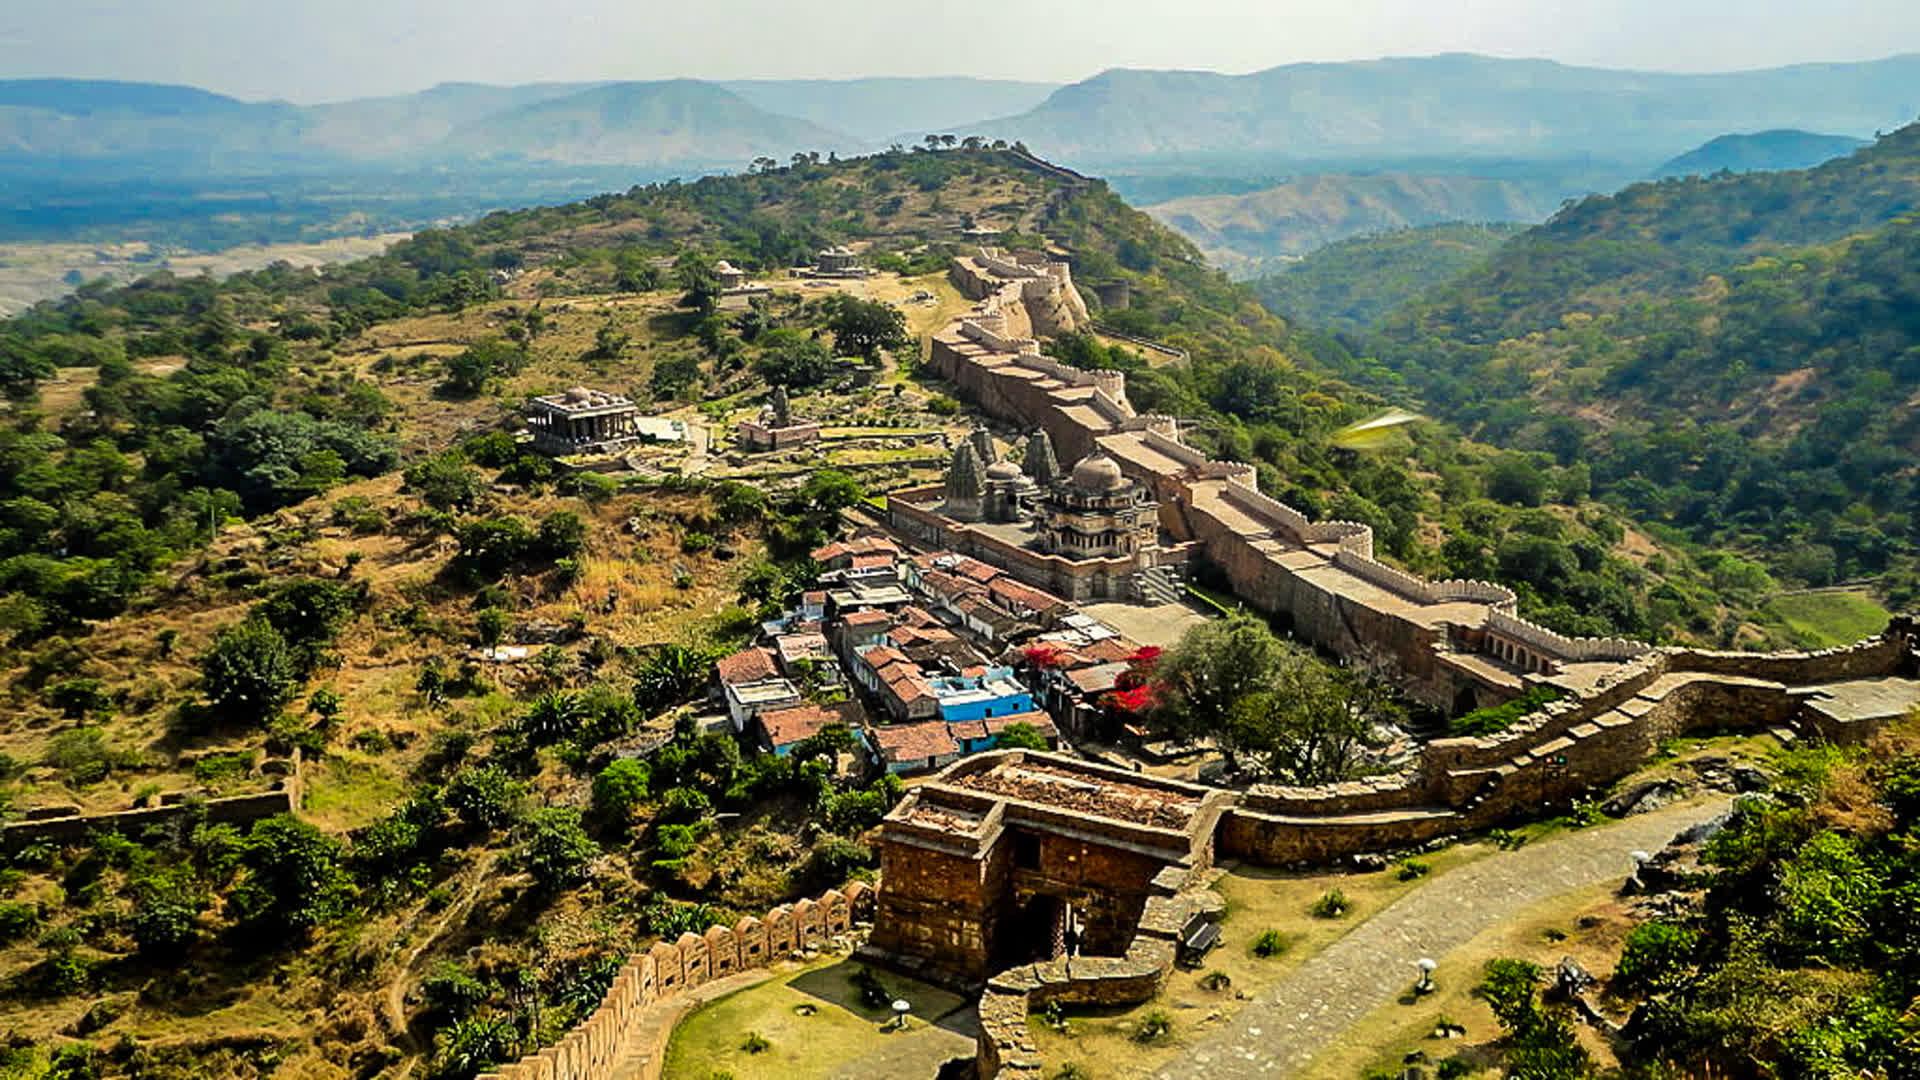 Kumbhalgarh: The Great Wall of India